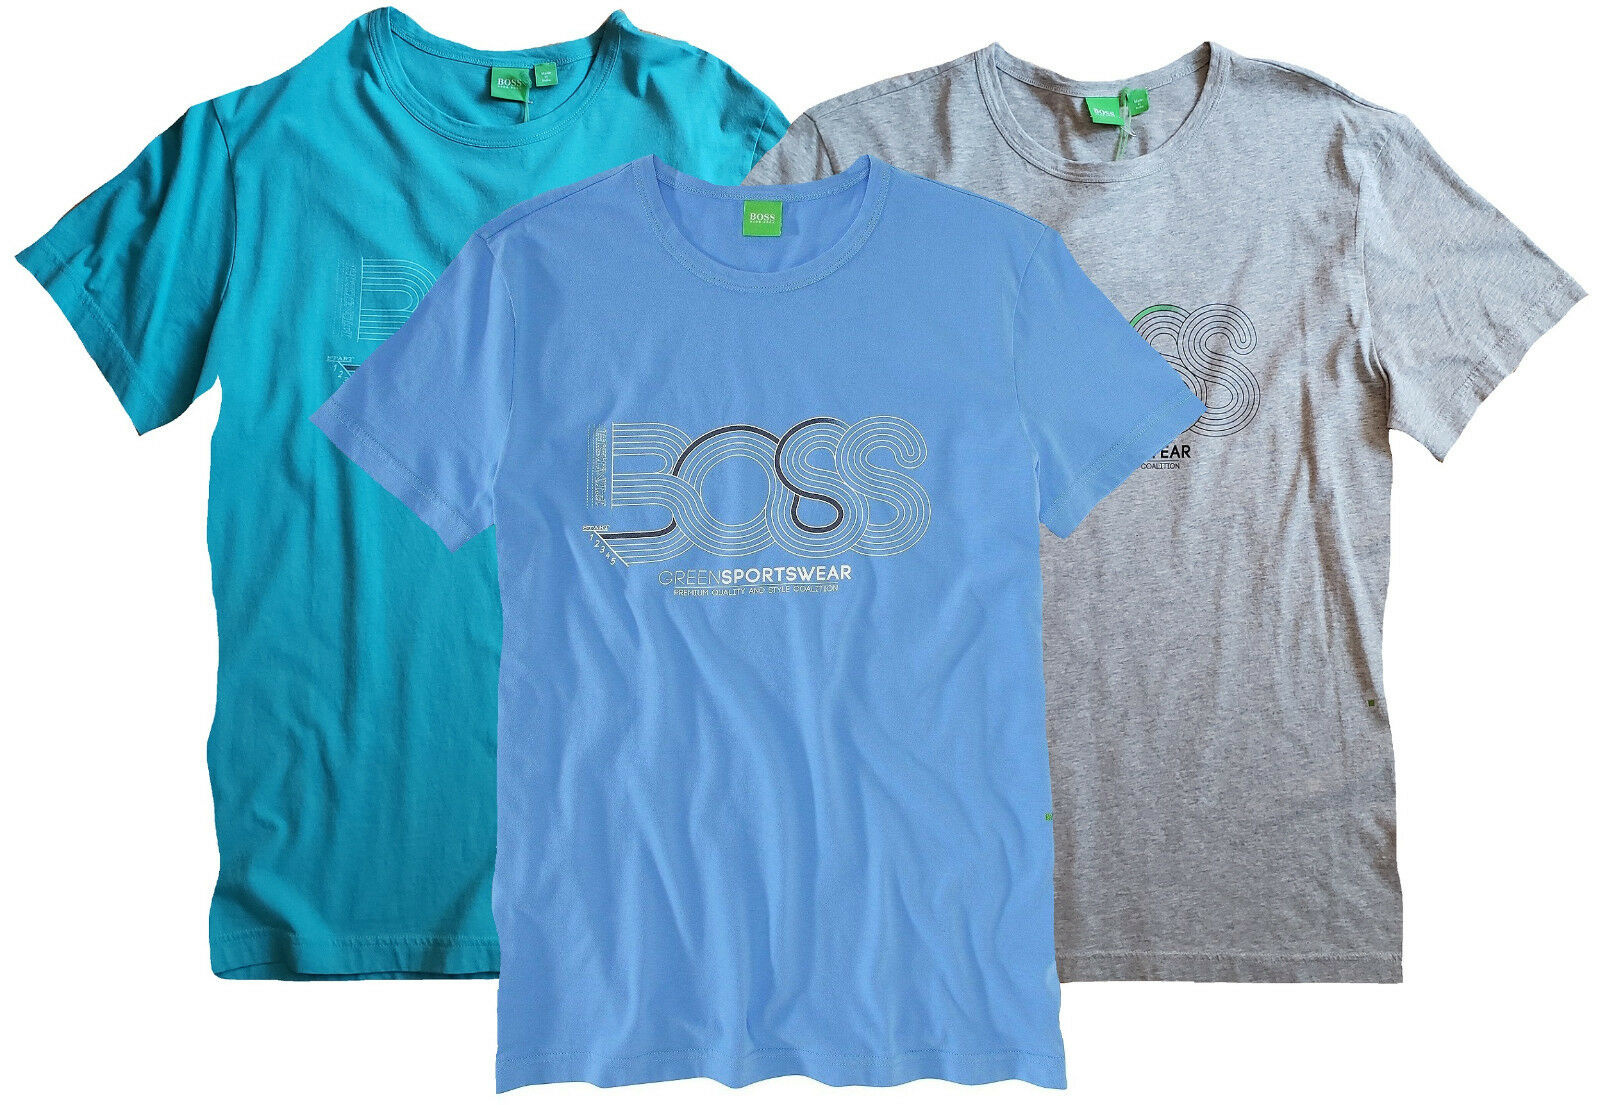 e3ac80e24 NWT Hugo Boss Green Label LOGO Tee Modern (Slim) Fit T-Shirt with Printed  Design oneedg3833-T-Shirts